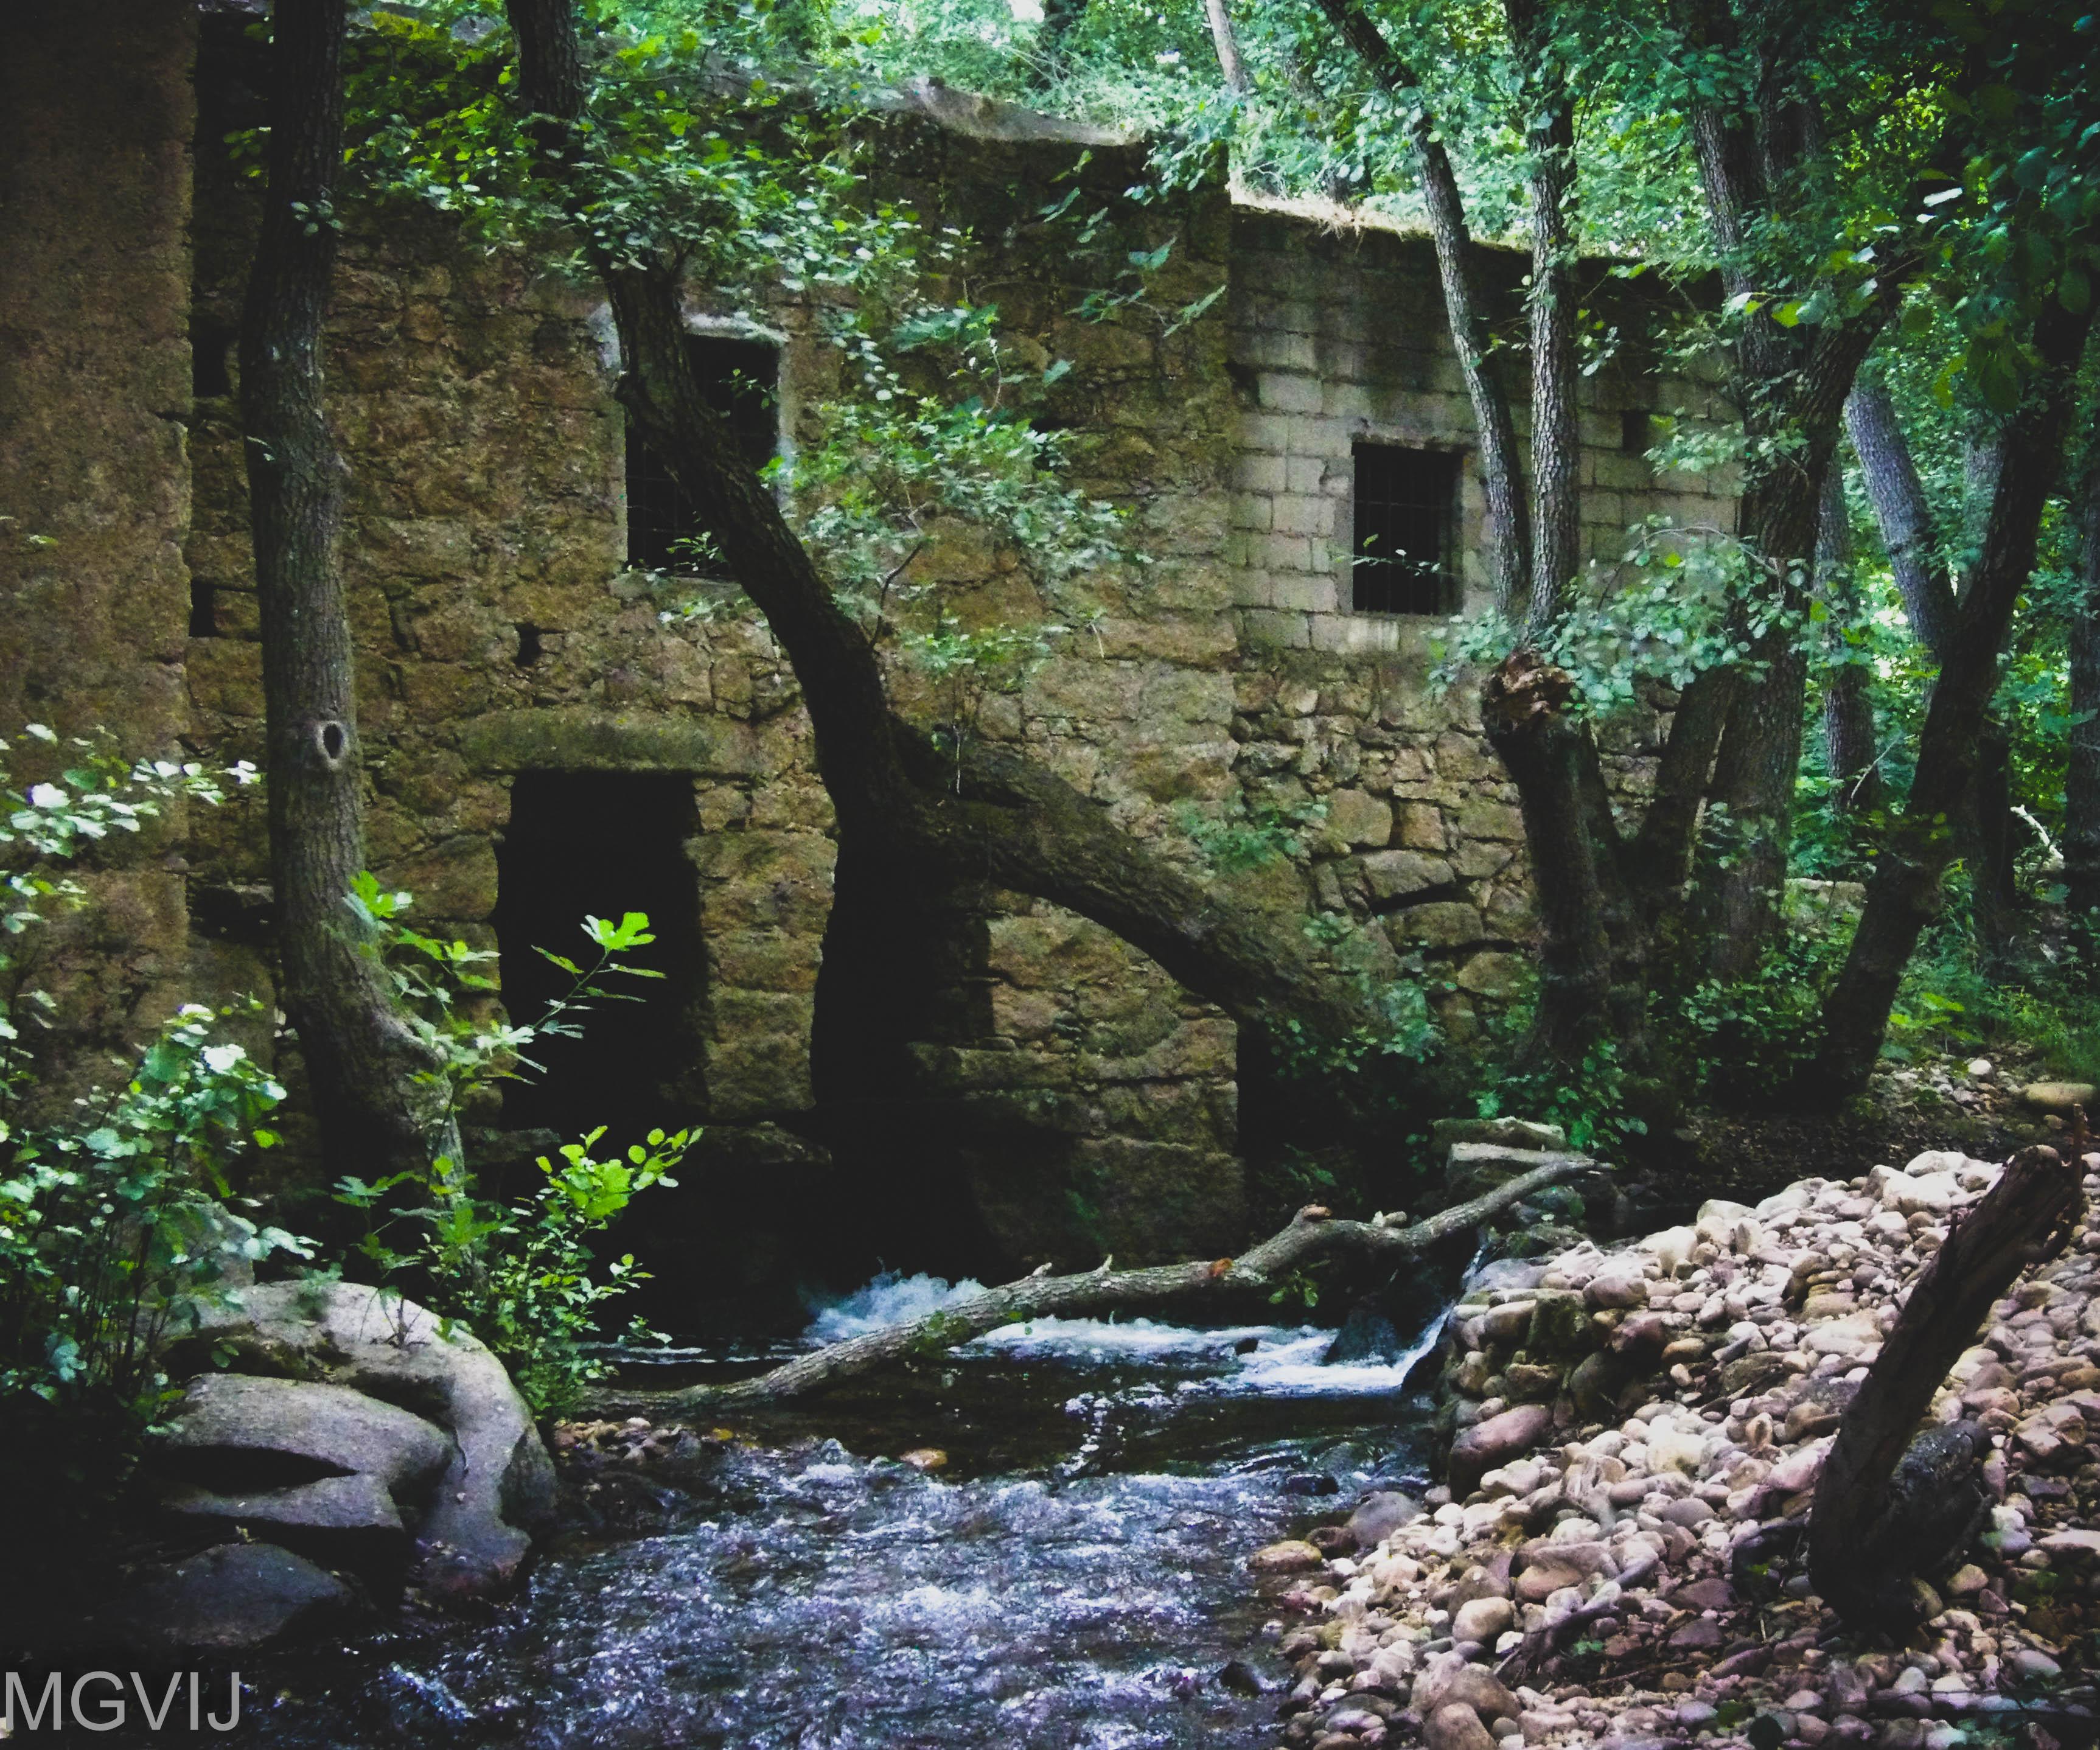 old watermill, River Ibor, Geopark Villuercas-Ibores-Jara, Extremadura, Spain